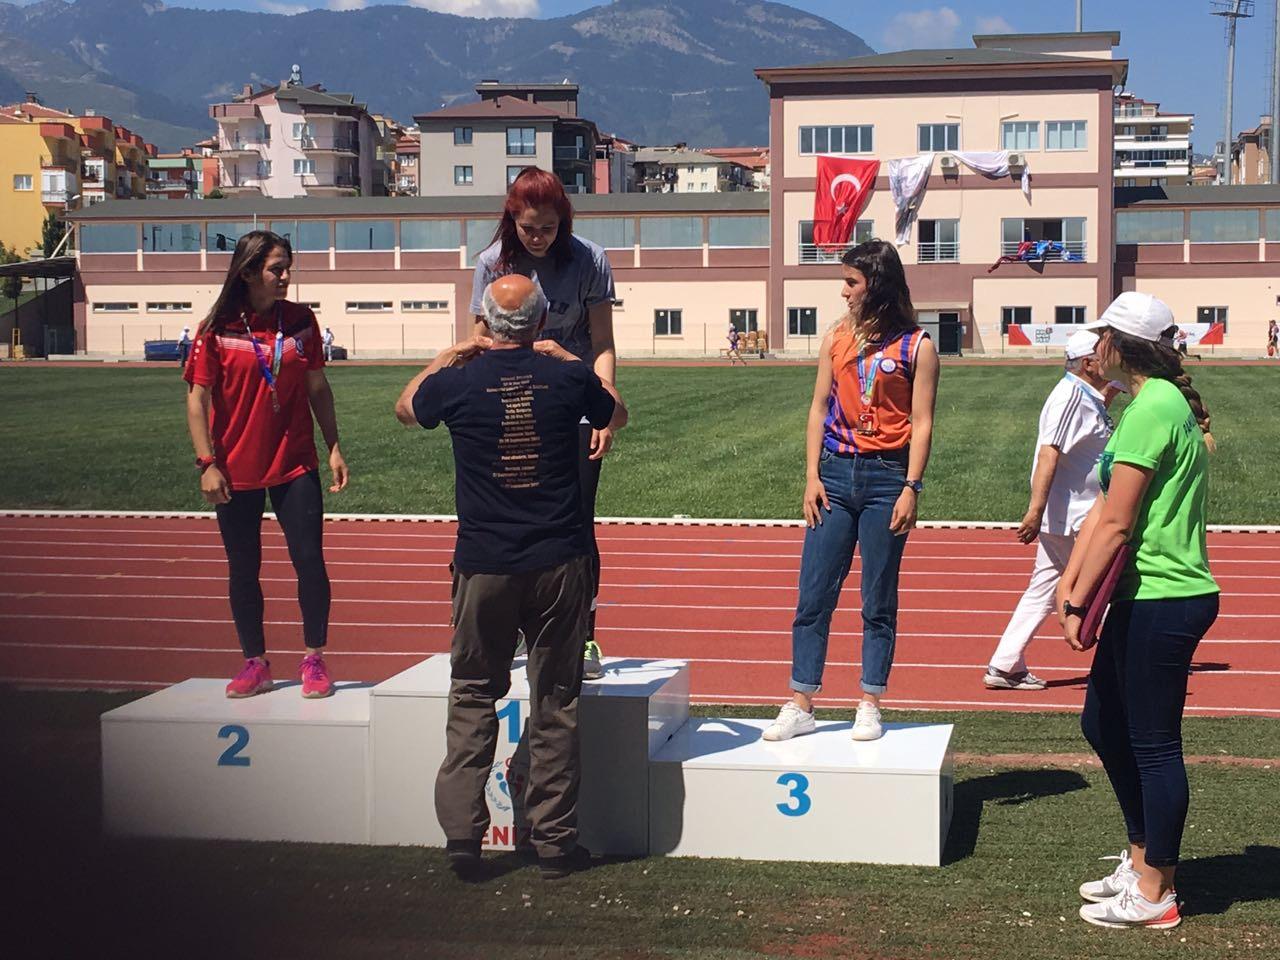 Achievement From Our University Athletics Team